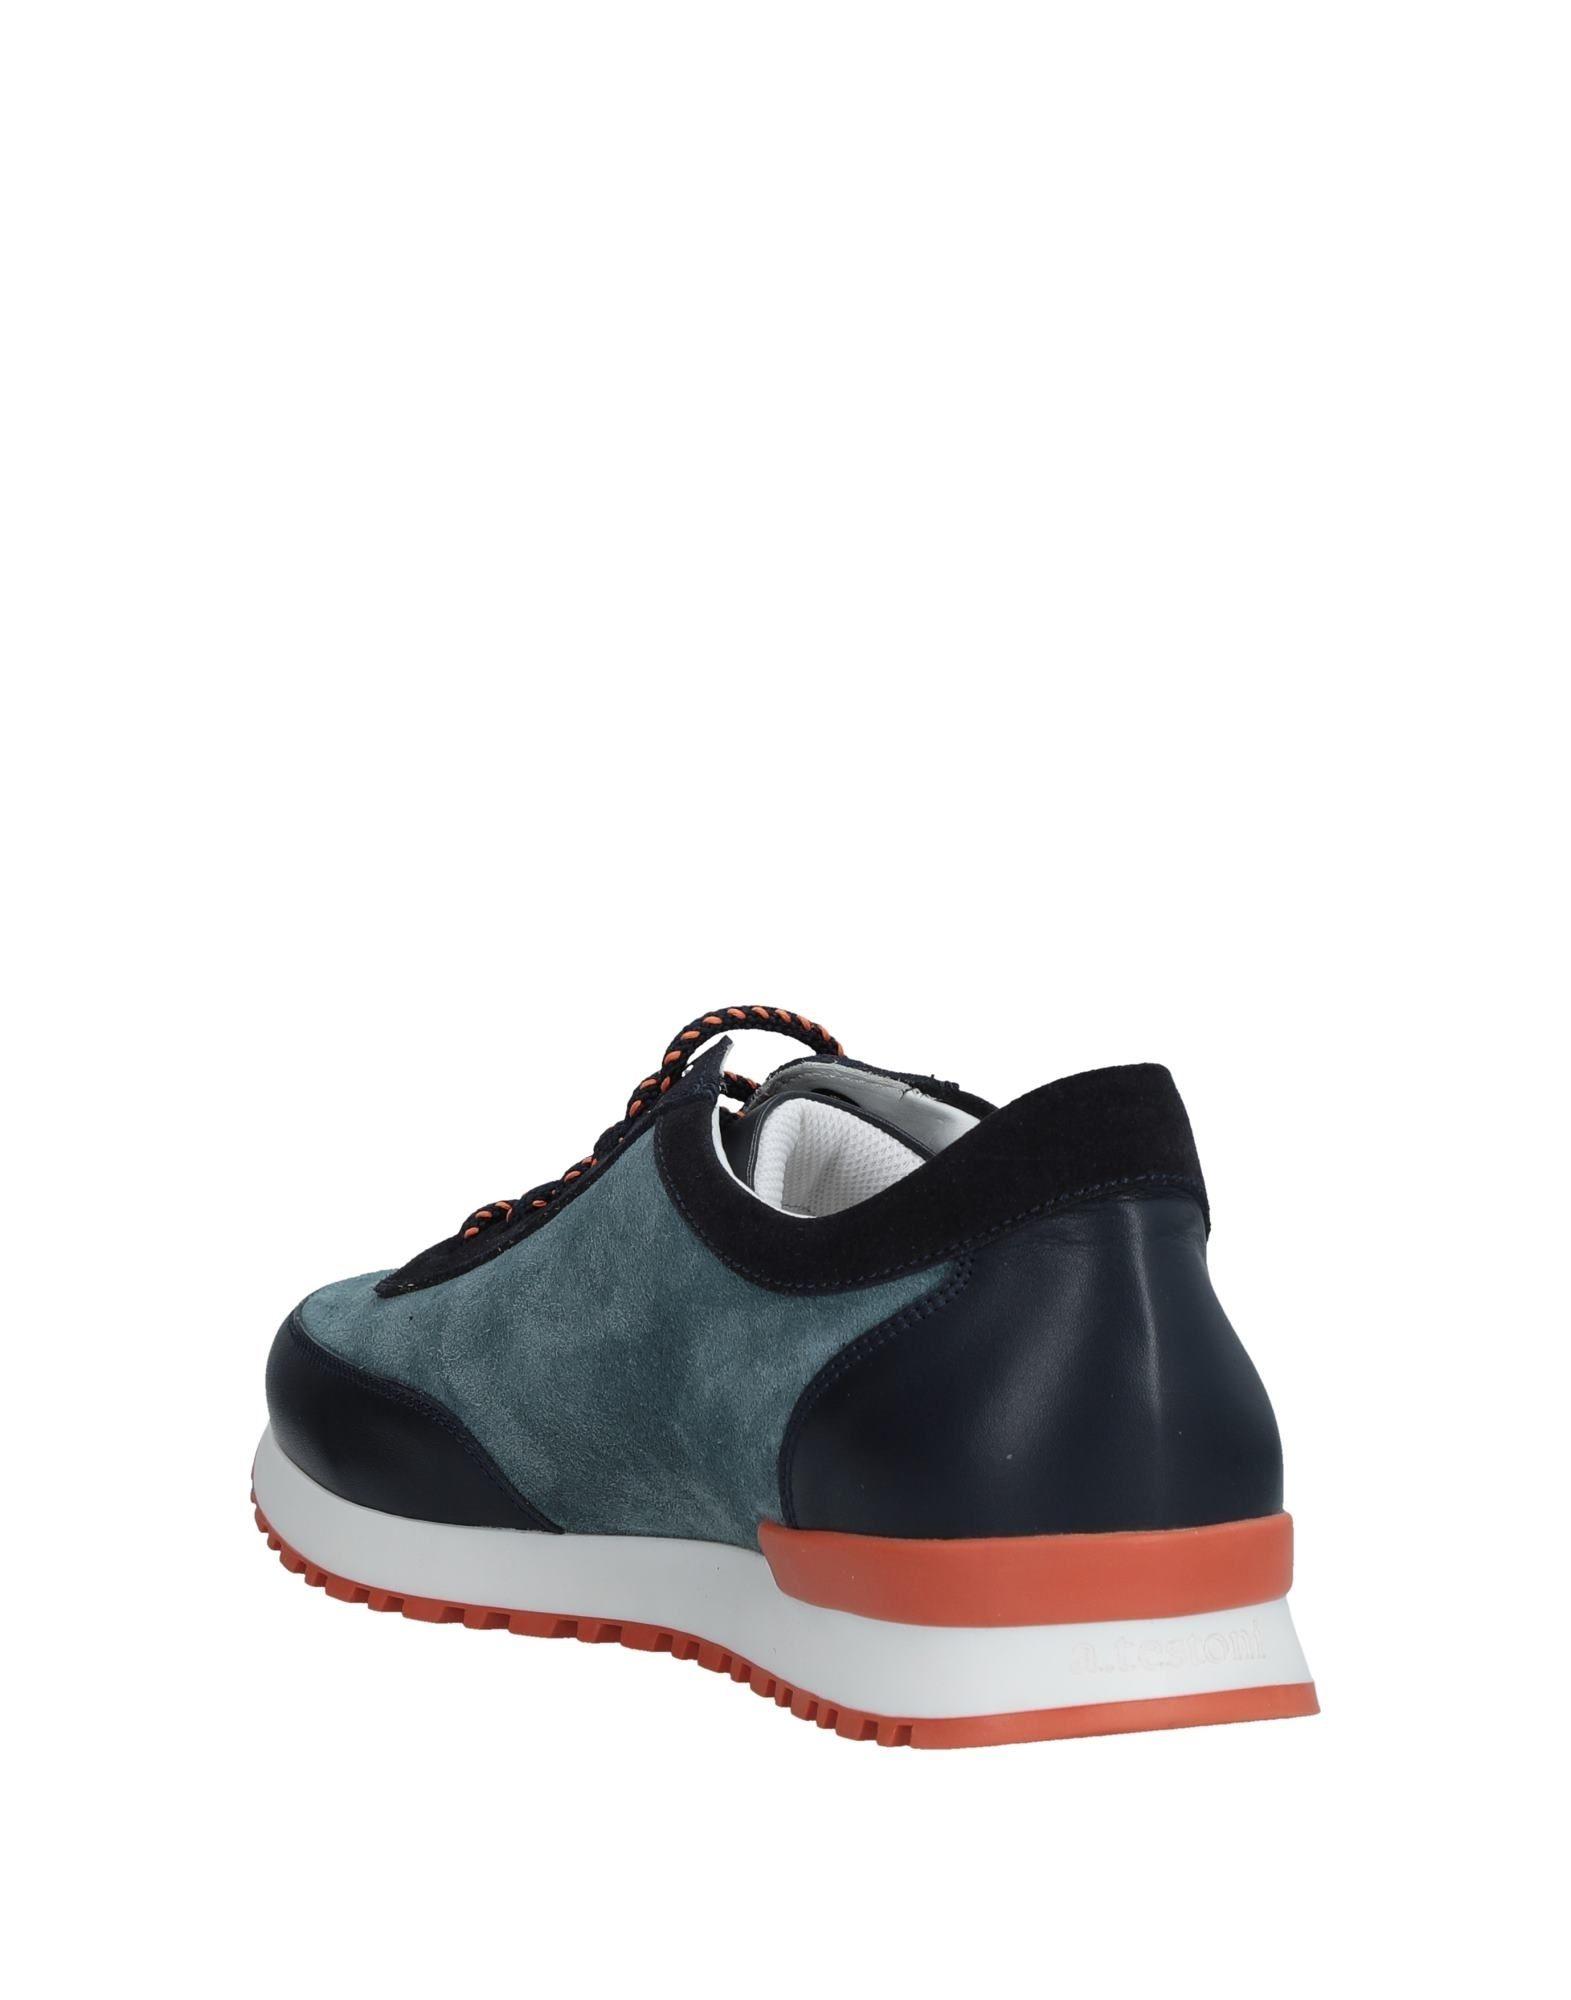 A.Testoni Sneakers Herren  11543048BX Gute Qualität beliebte Schuhe